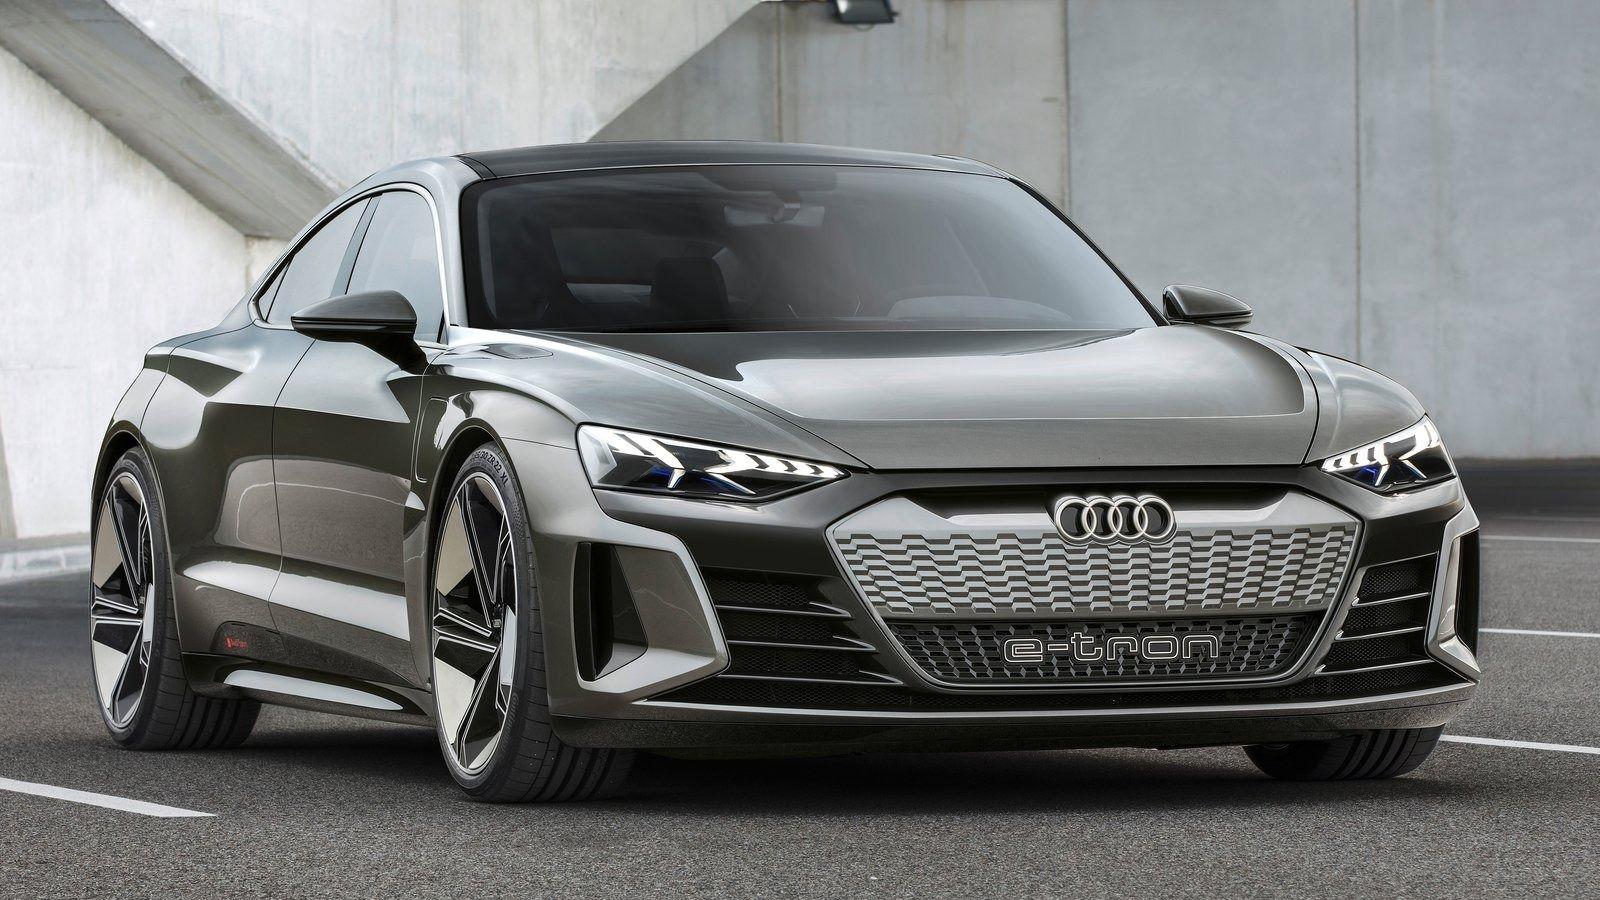 New Audi E Tron Gt Concept Audi E Tron E Tron Audi Cars